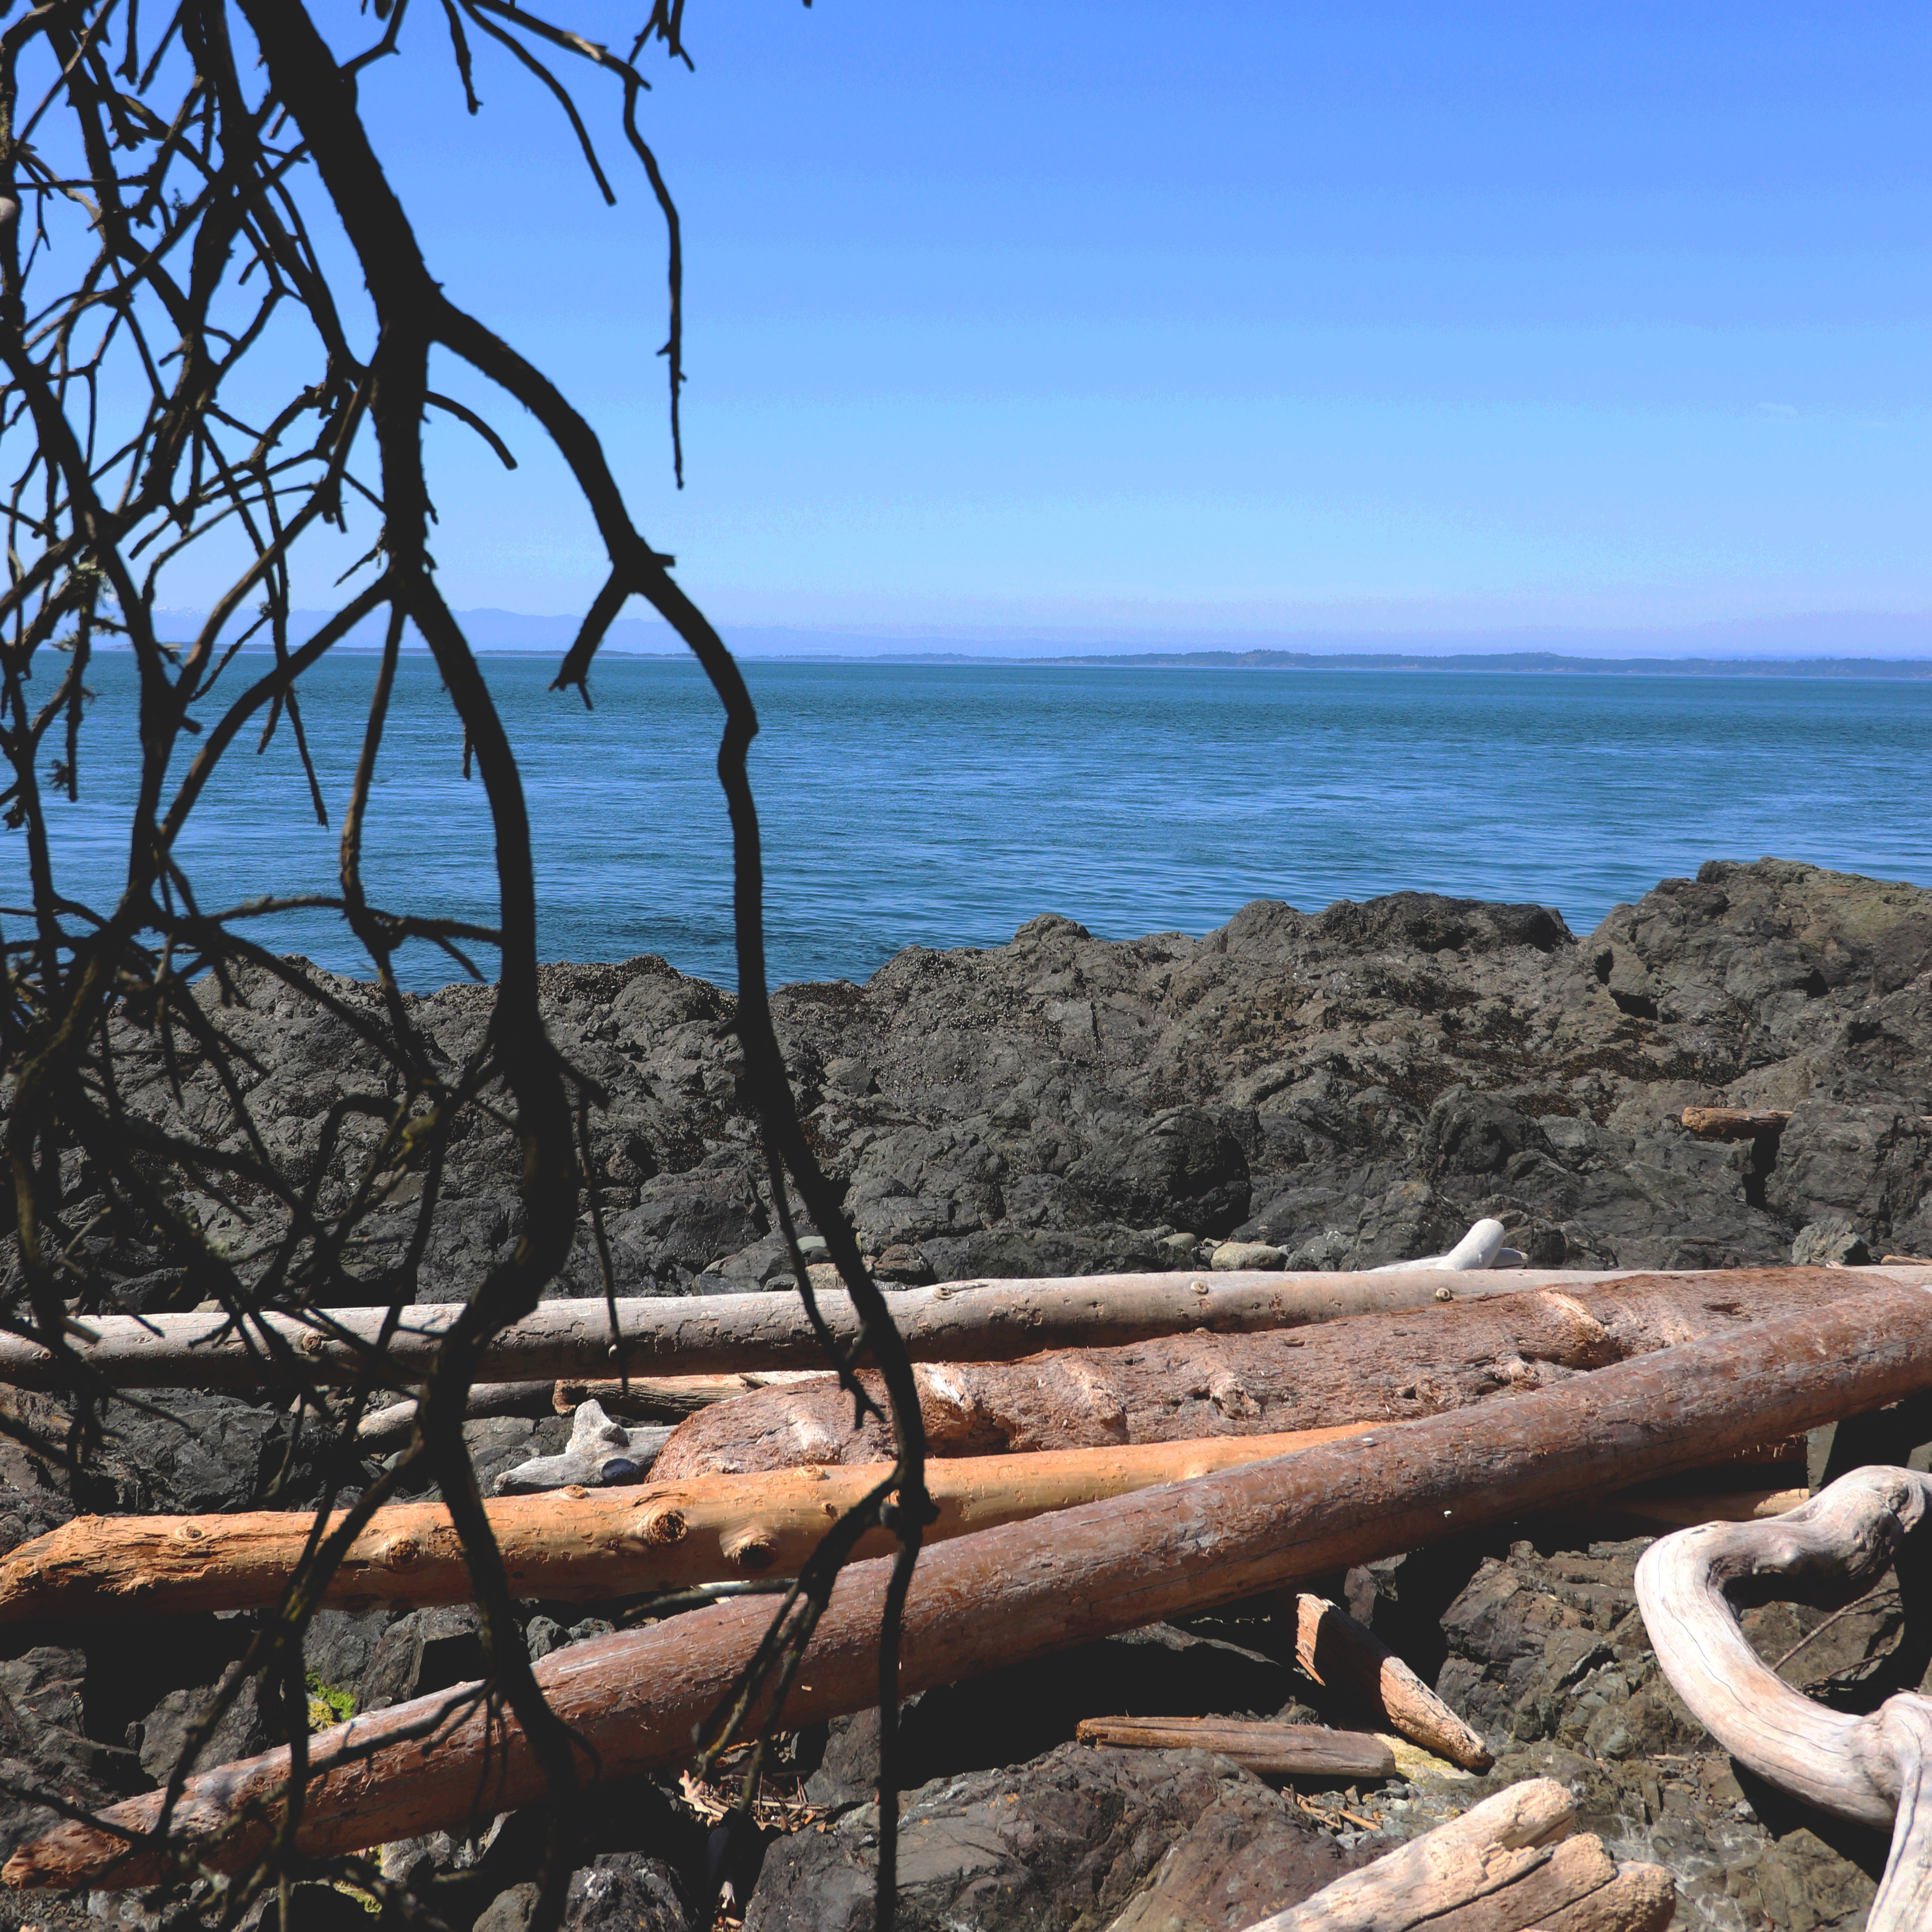 Tumble and Tides